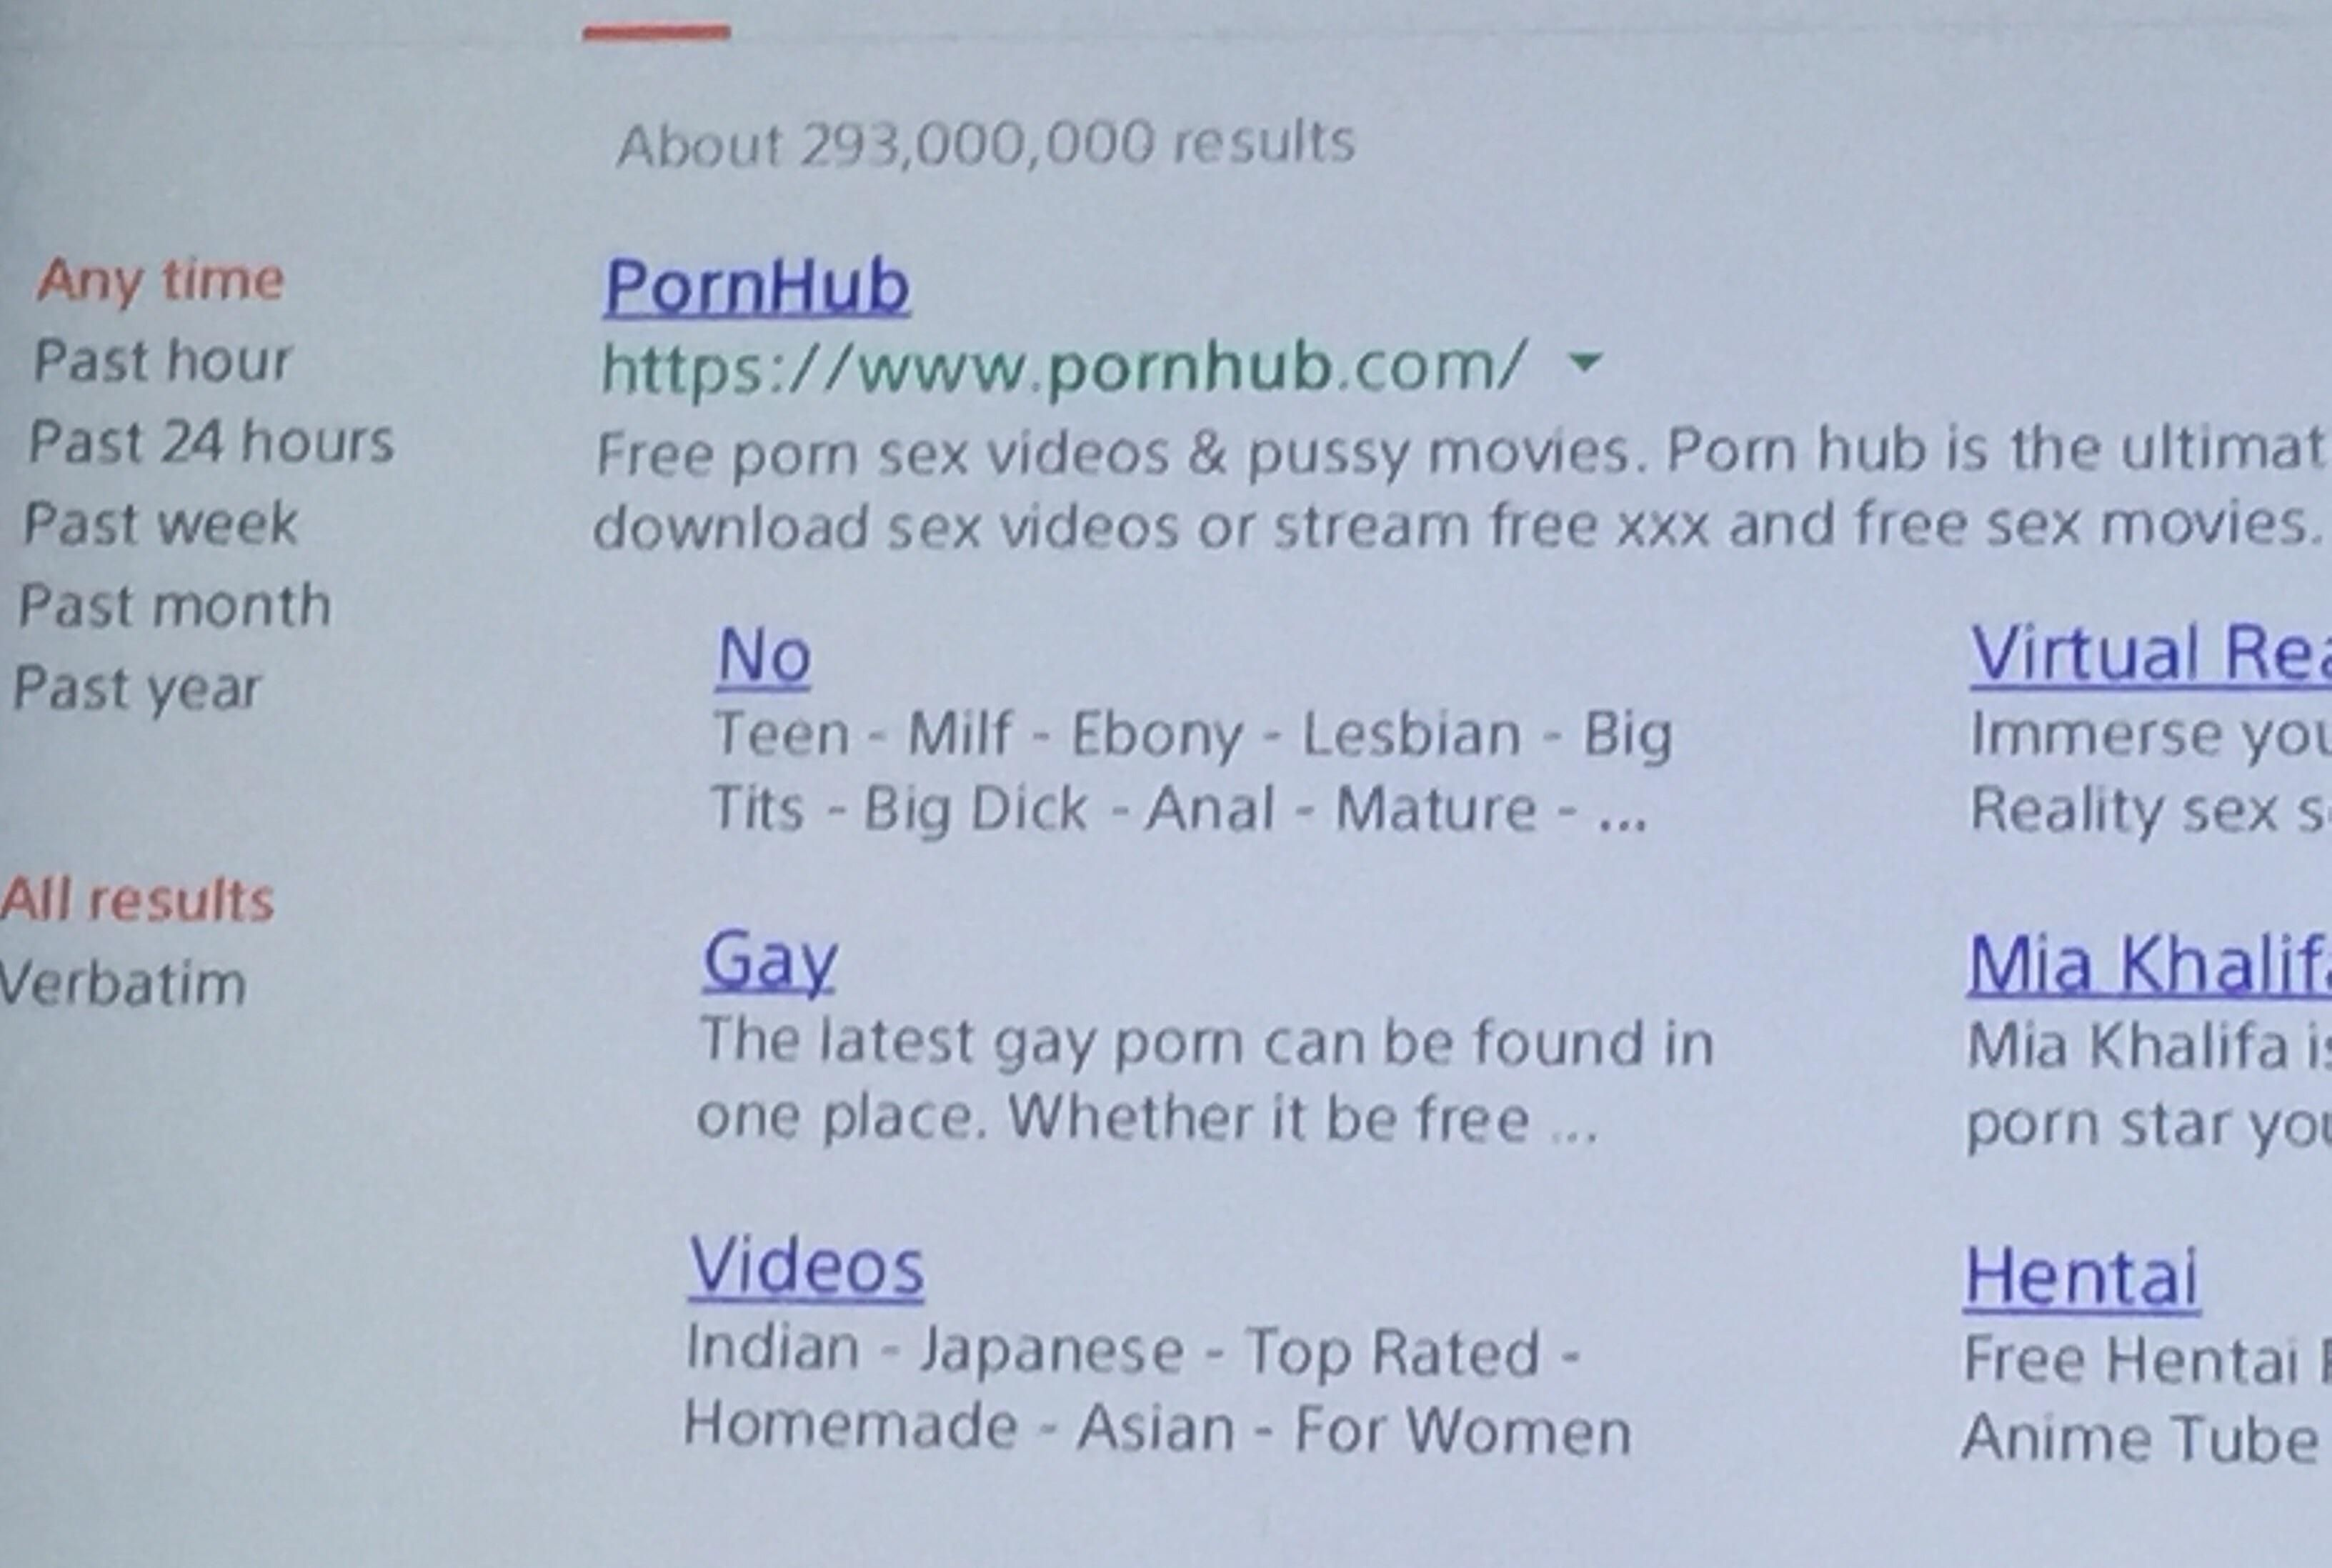 Gay Mature Milf Tube